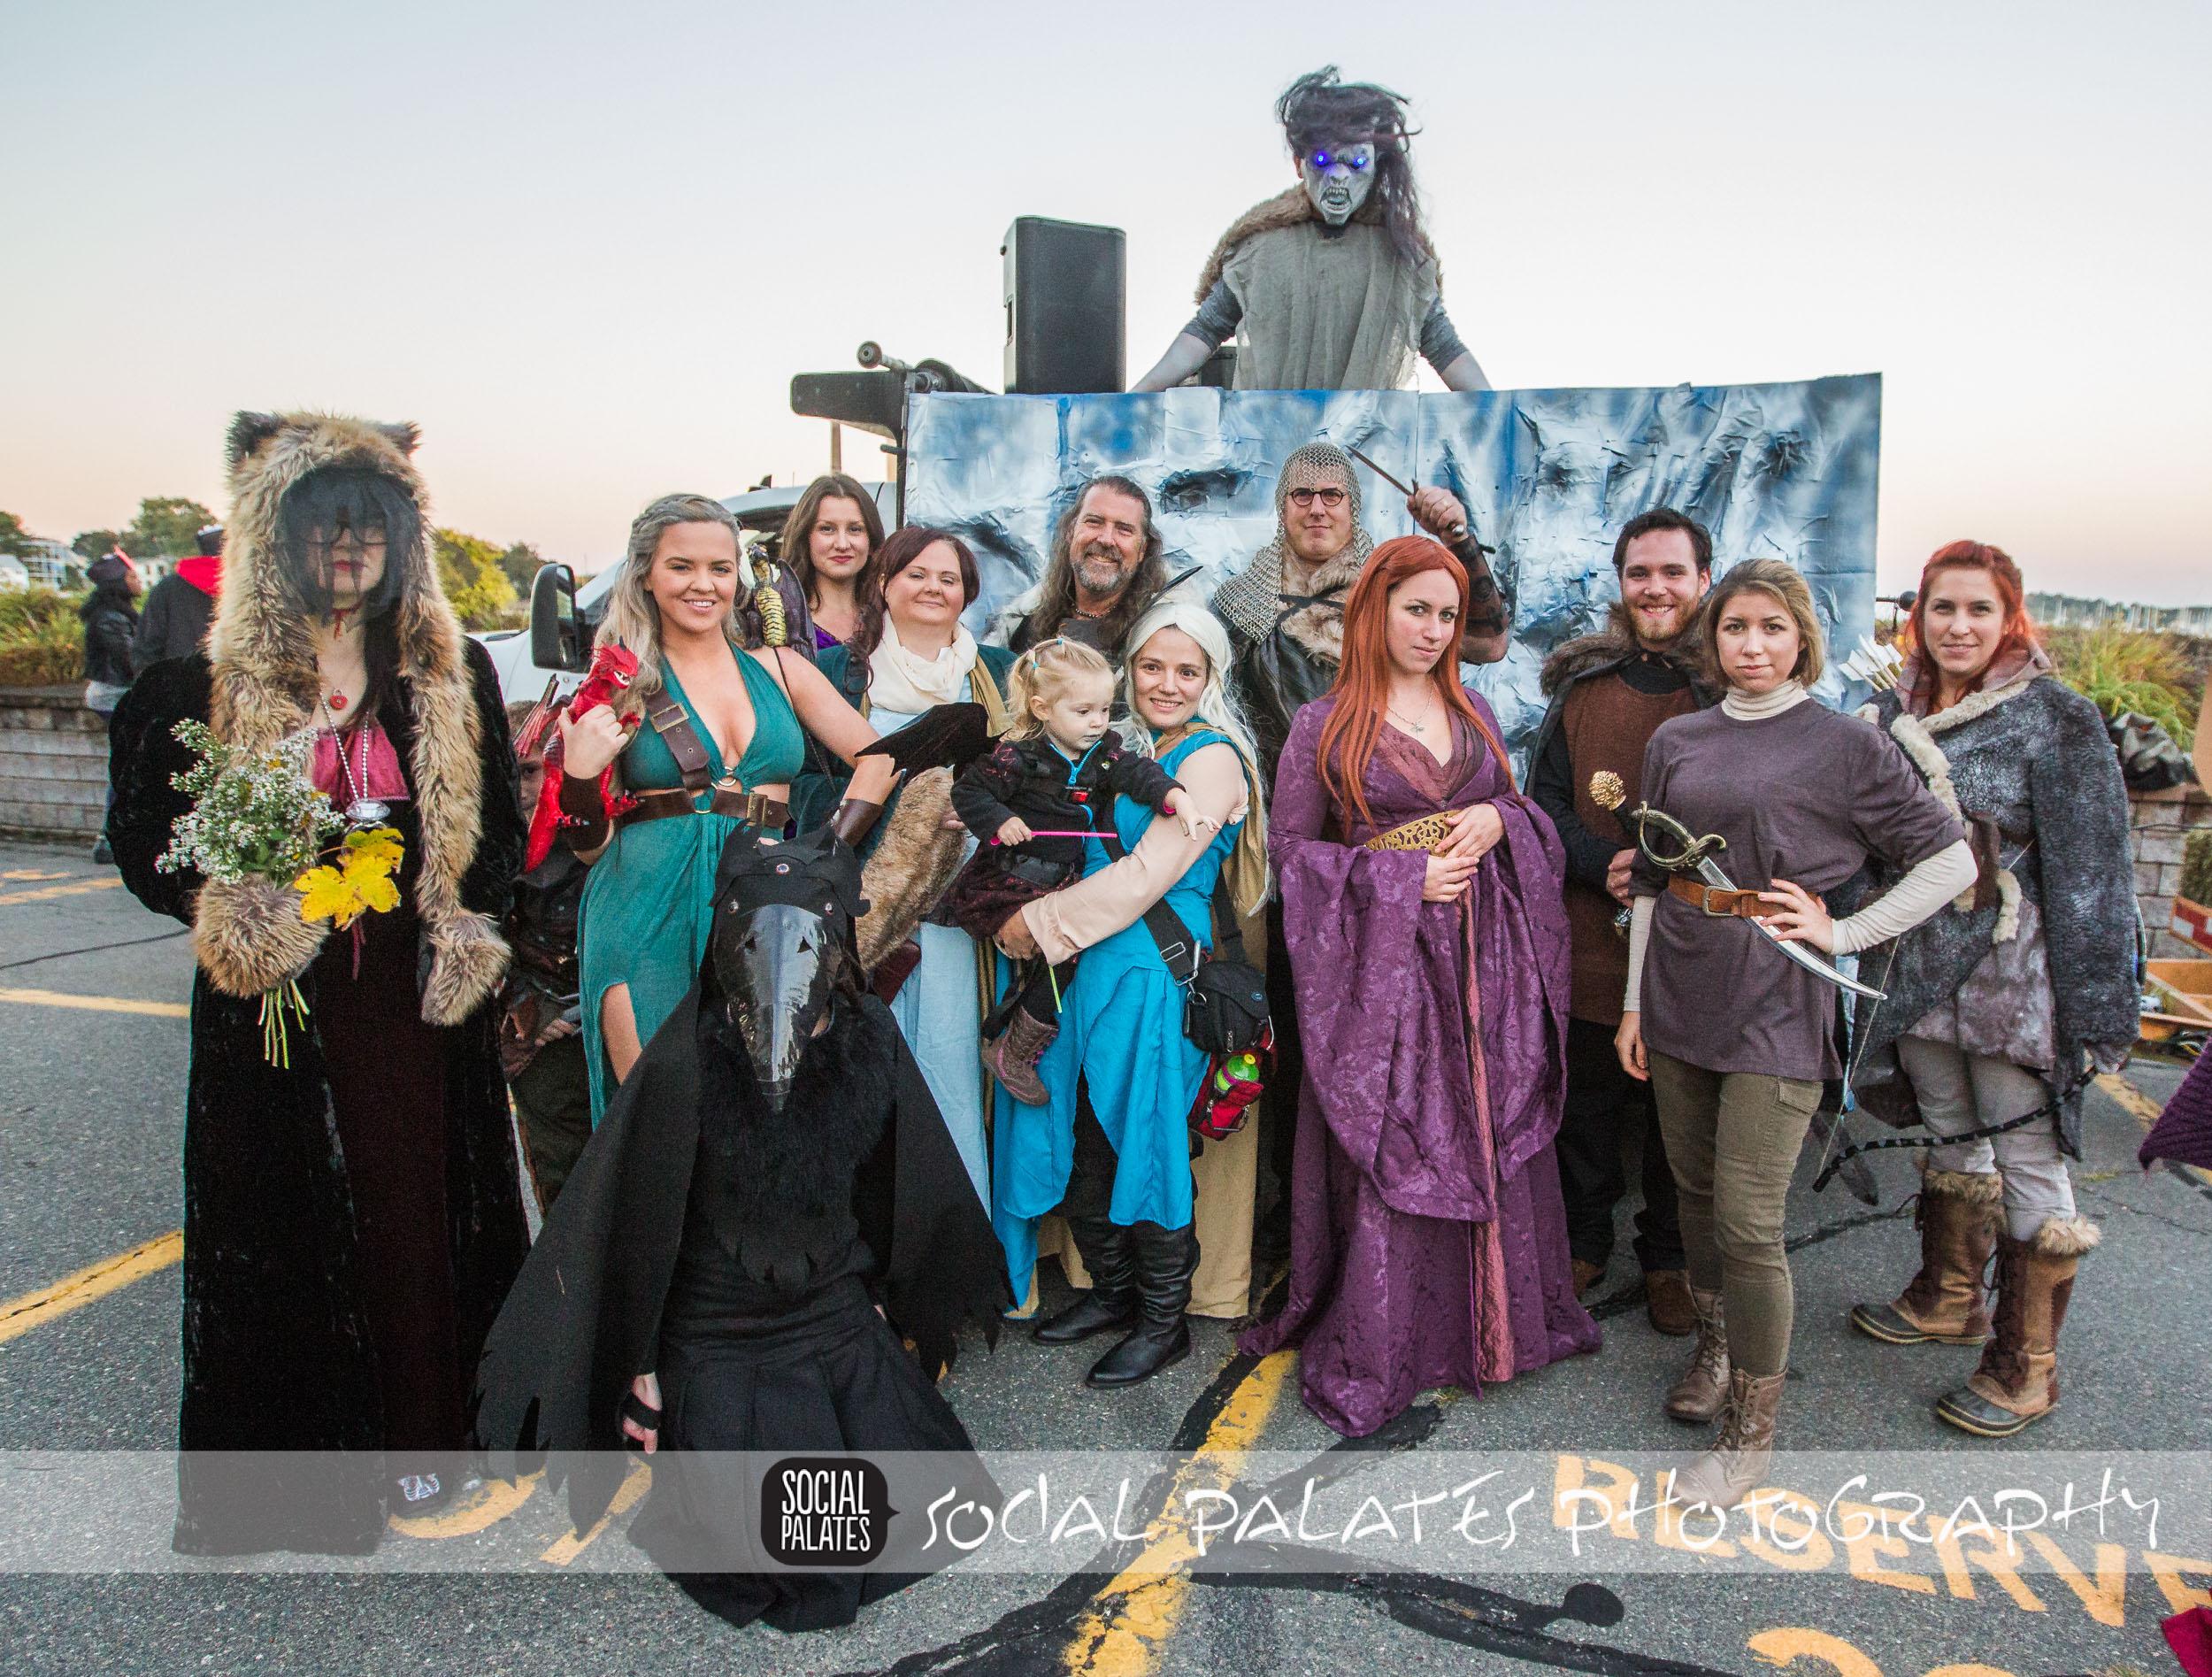 Haunted Happenings Parade 2014 Creative Salem by Social Palates-7256.jpg